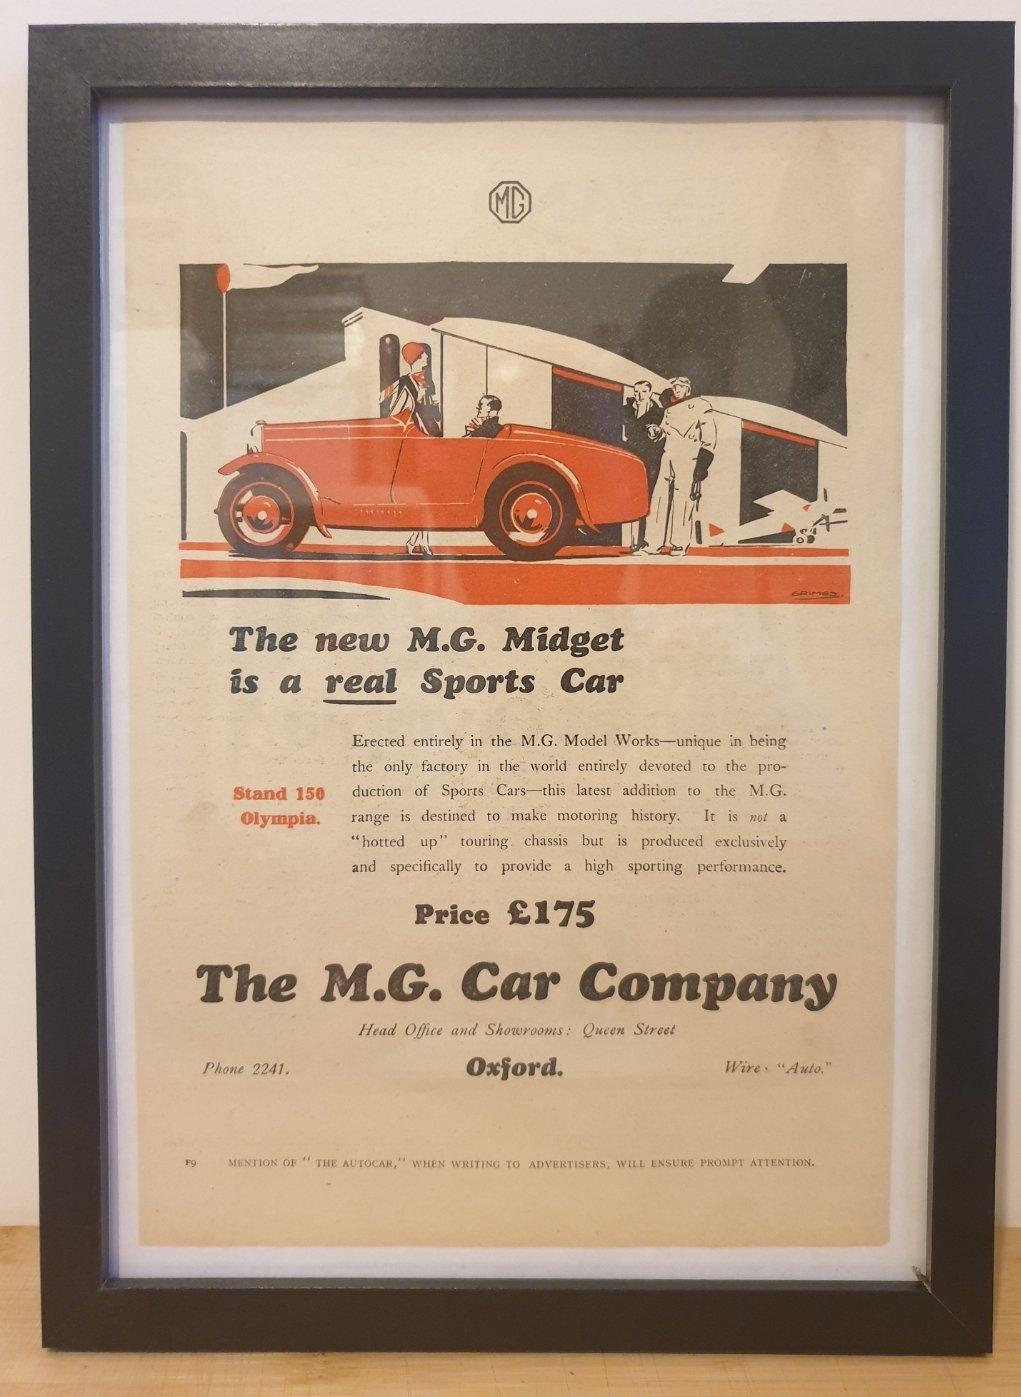 1968 Original 1928 MG Midget Framed Advert  For Sale (picture 1 of 3)